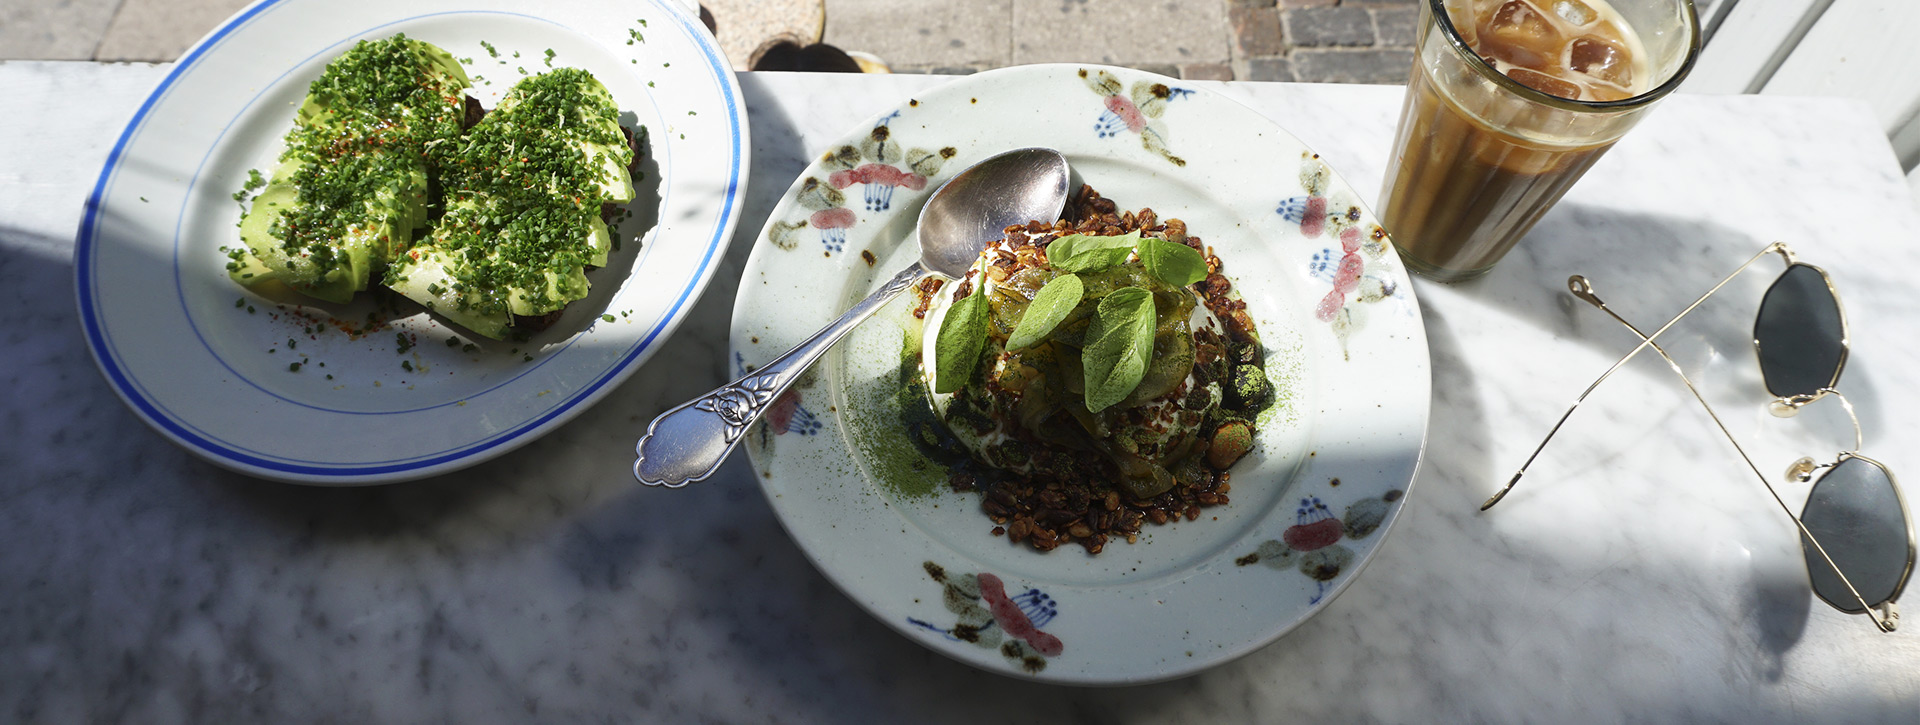 Avocado-Mad in Copenhagen